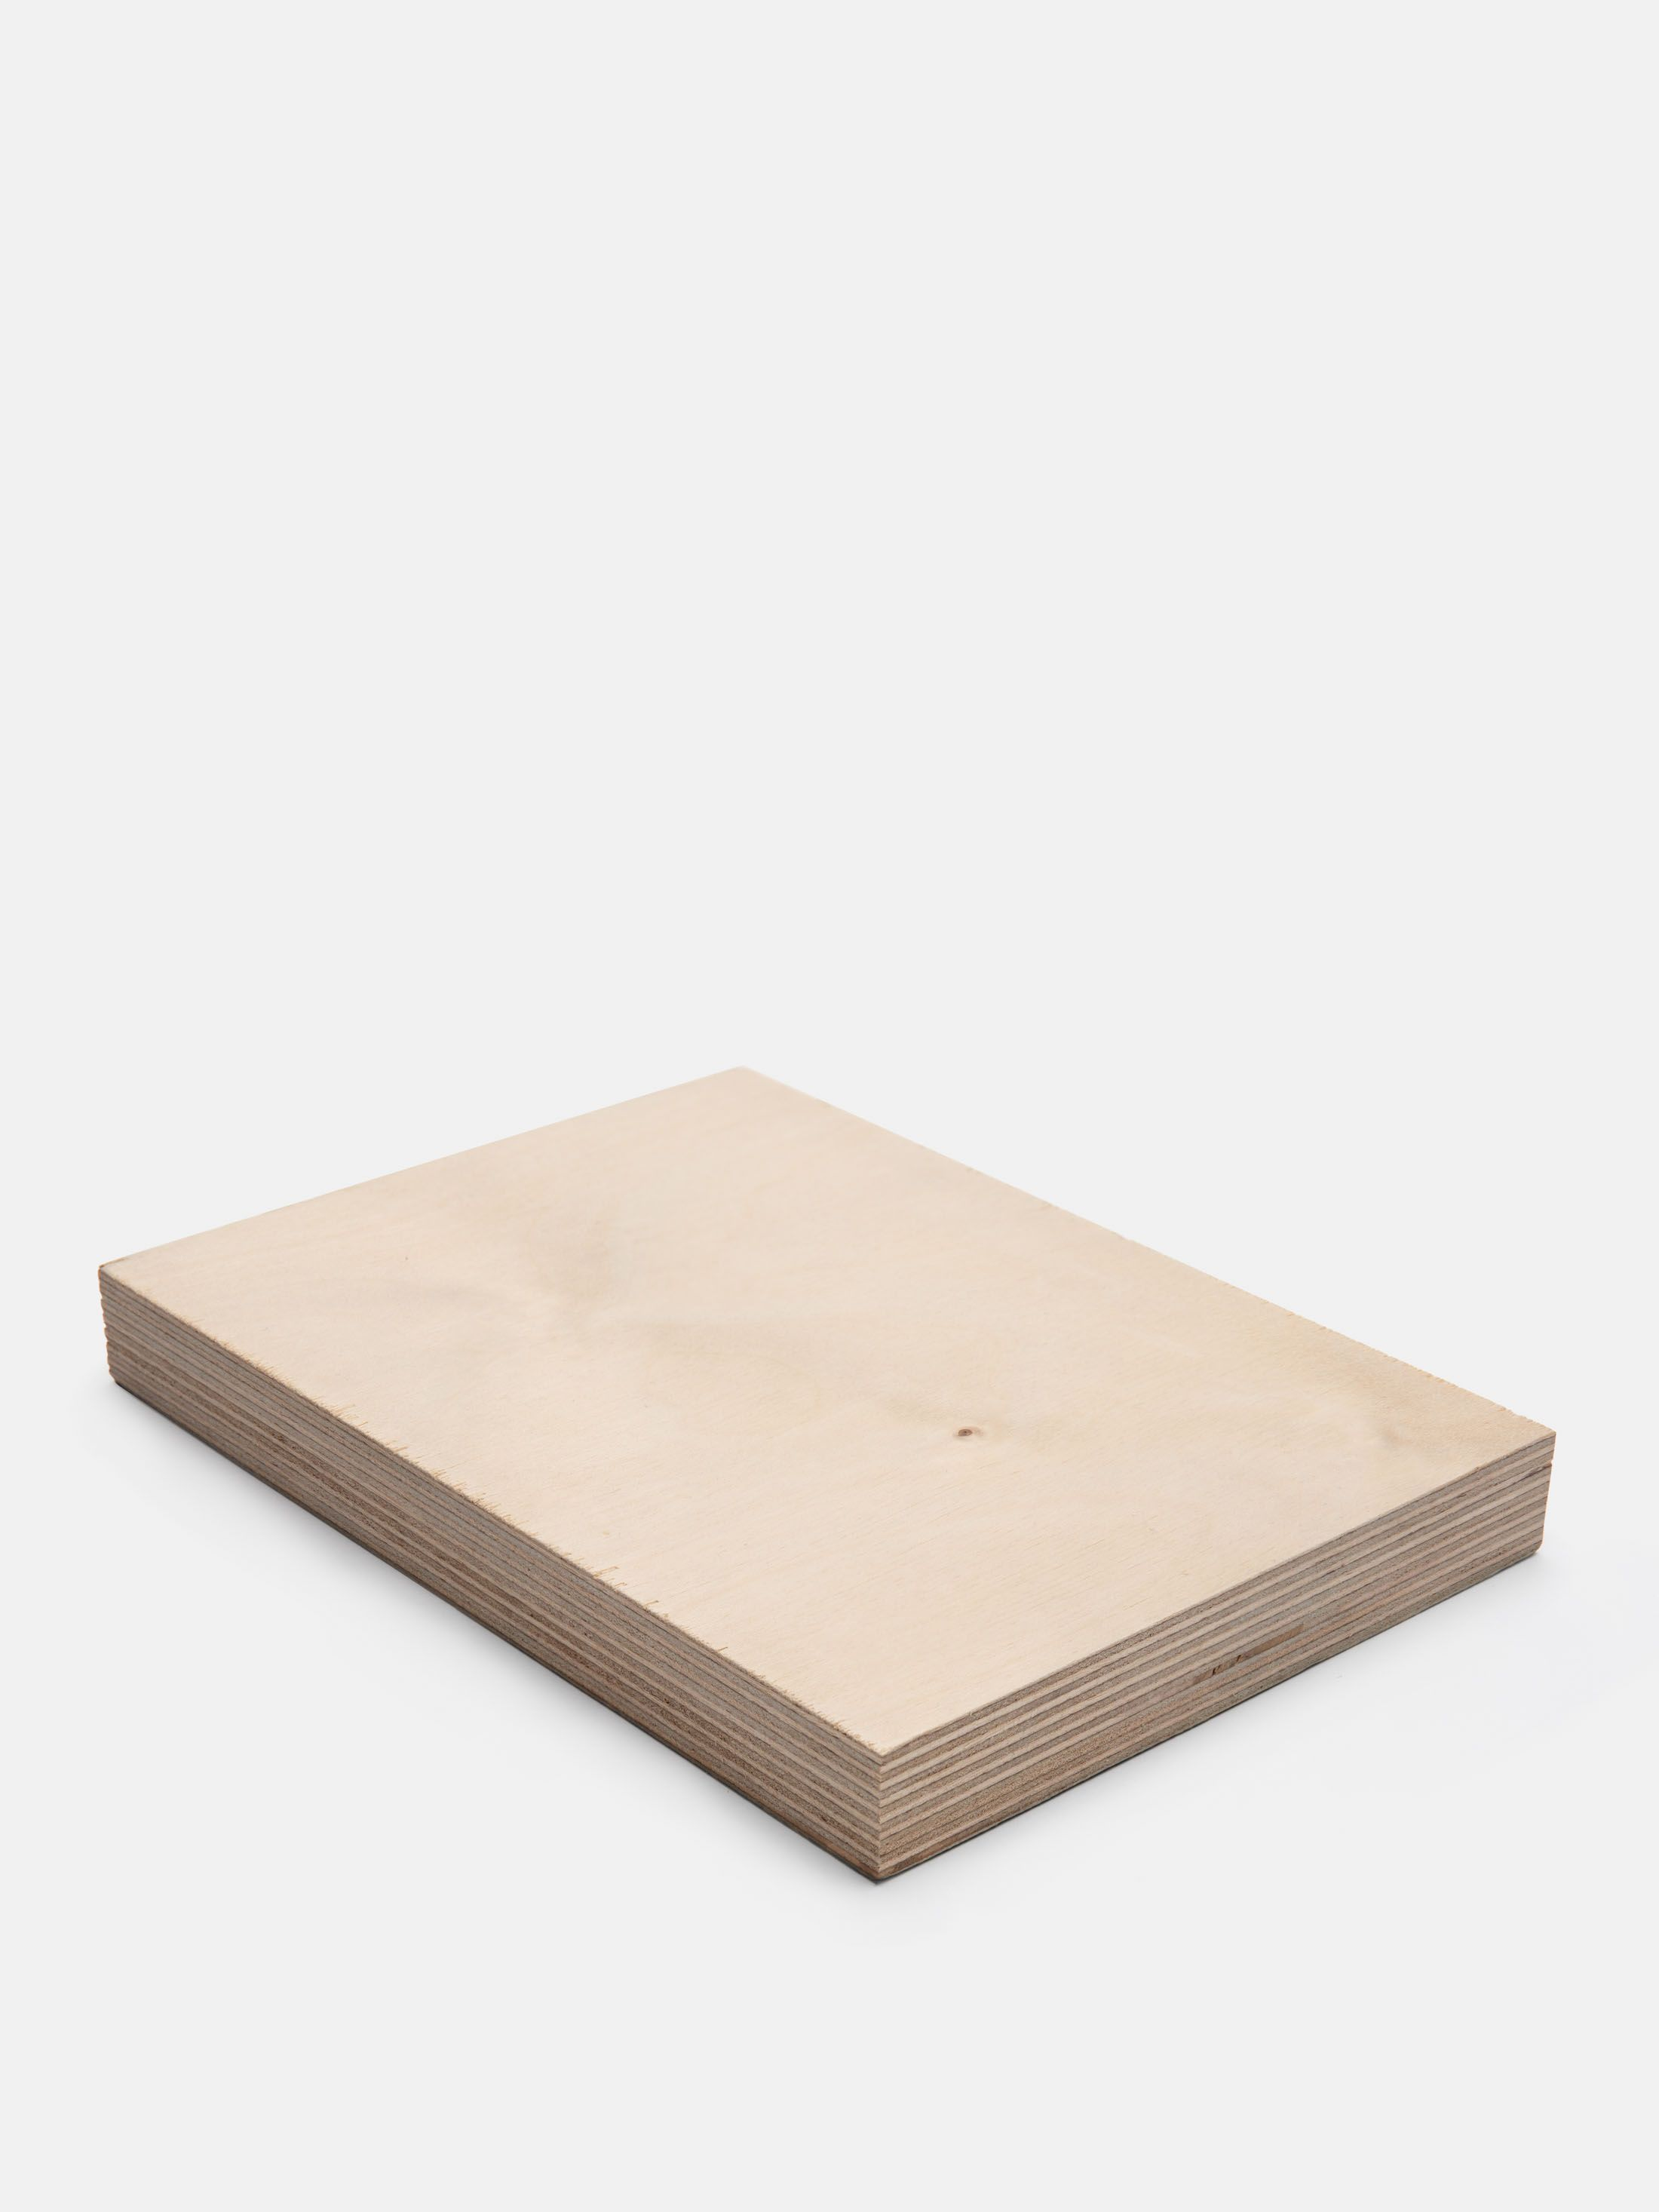 Rückseite 30x30cm Quadrat